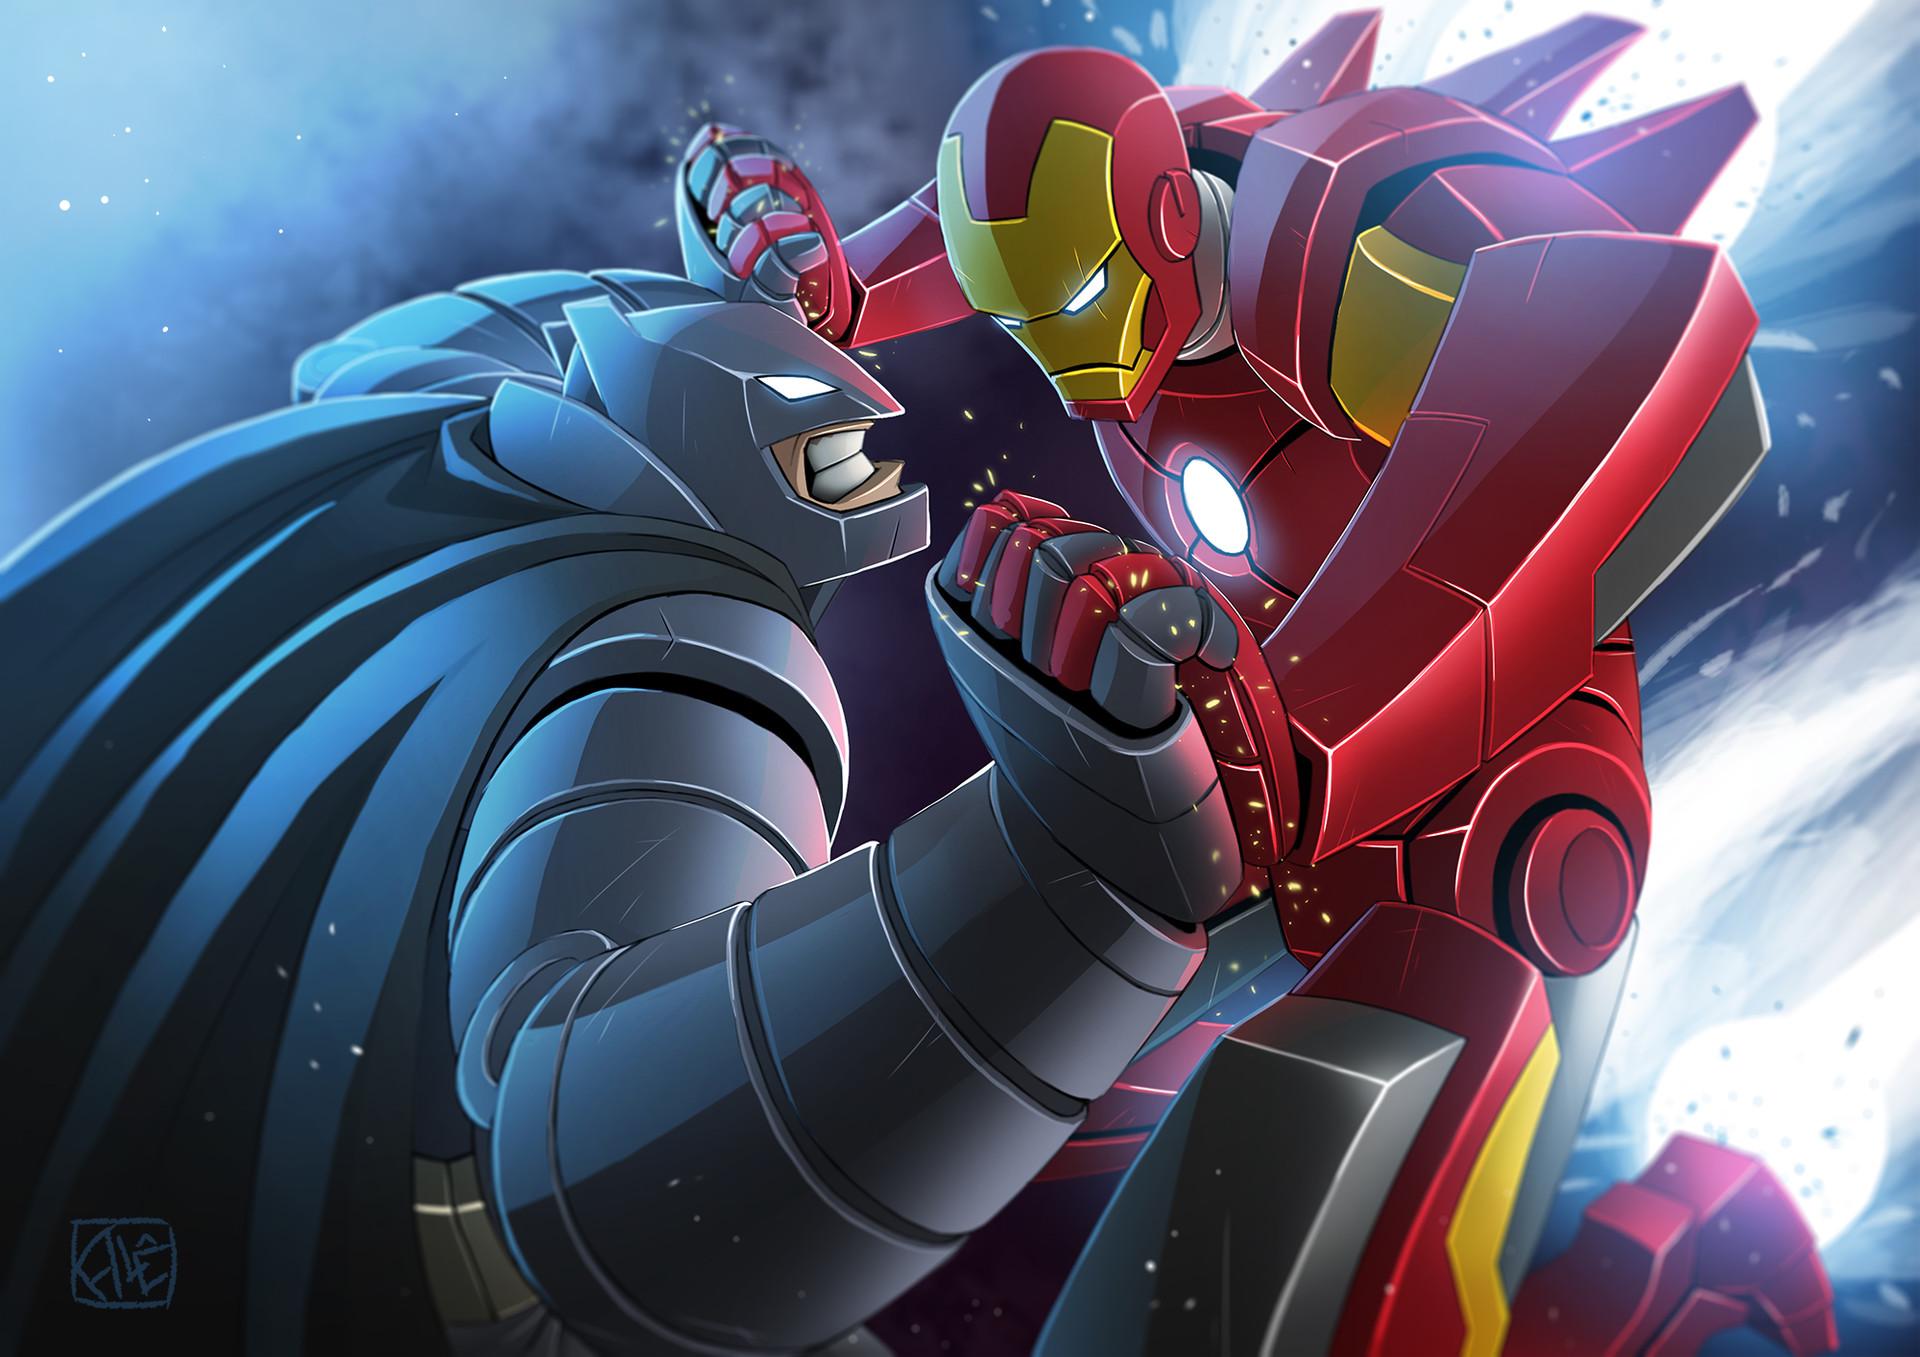 ArtStation - Batman vs Ironman, Alessandro Almeida